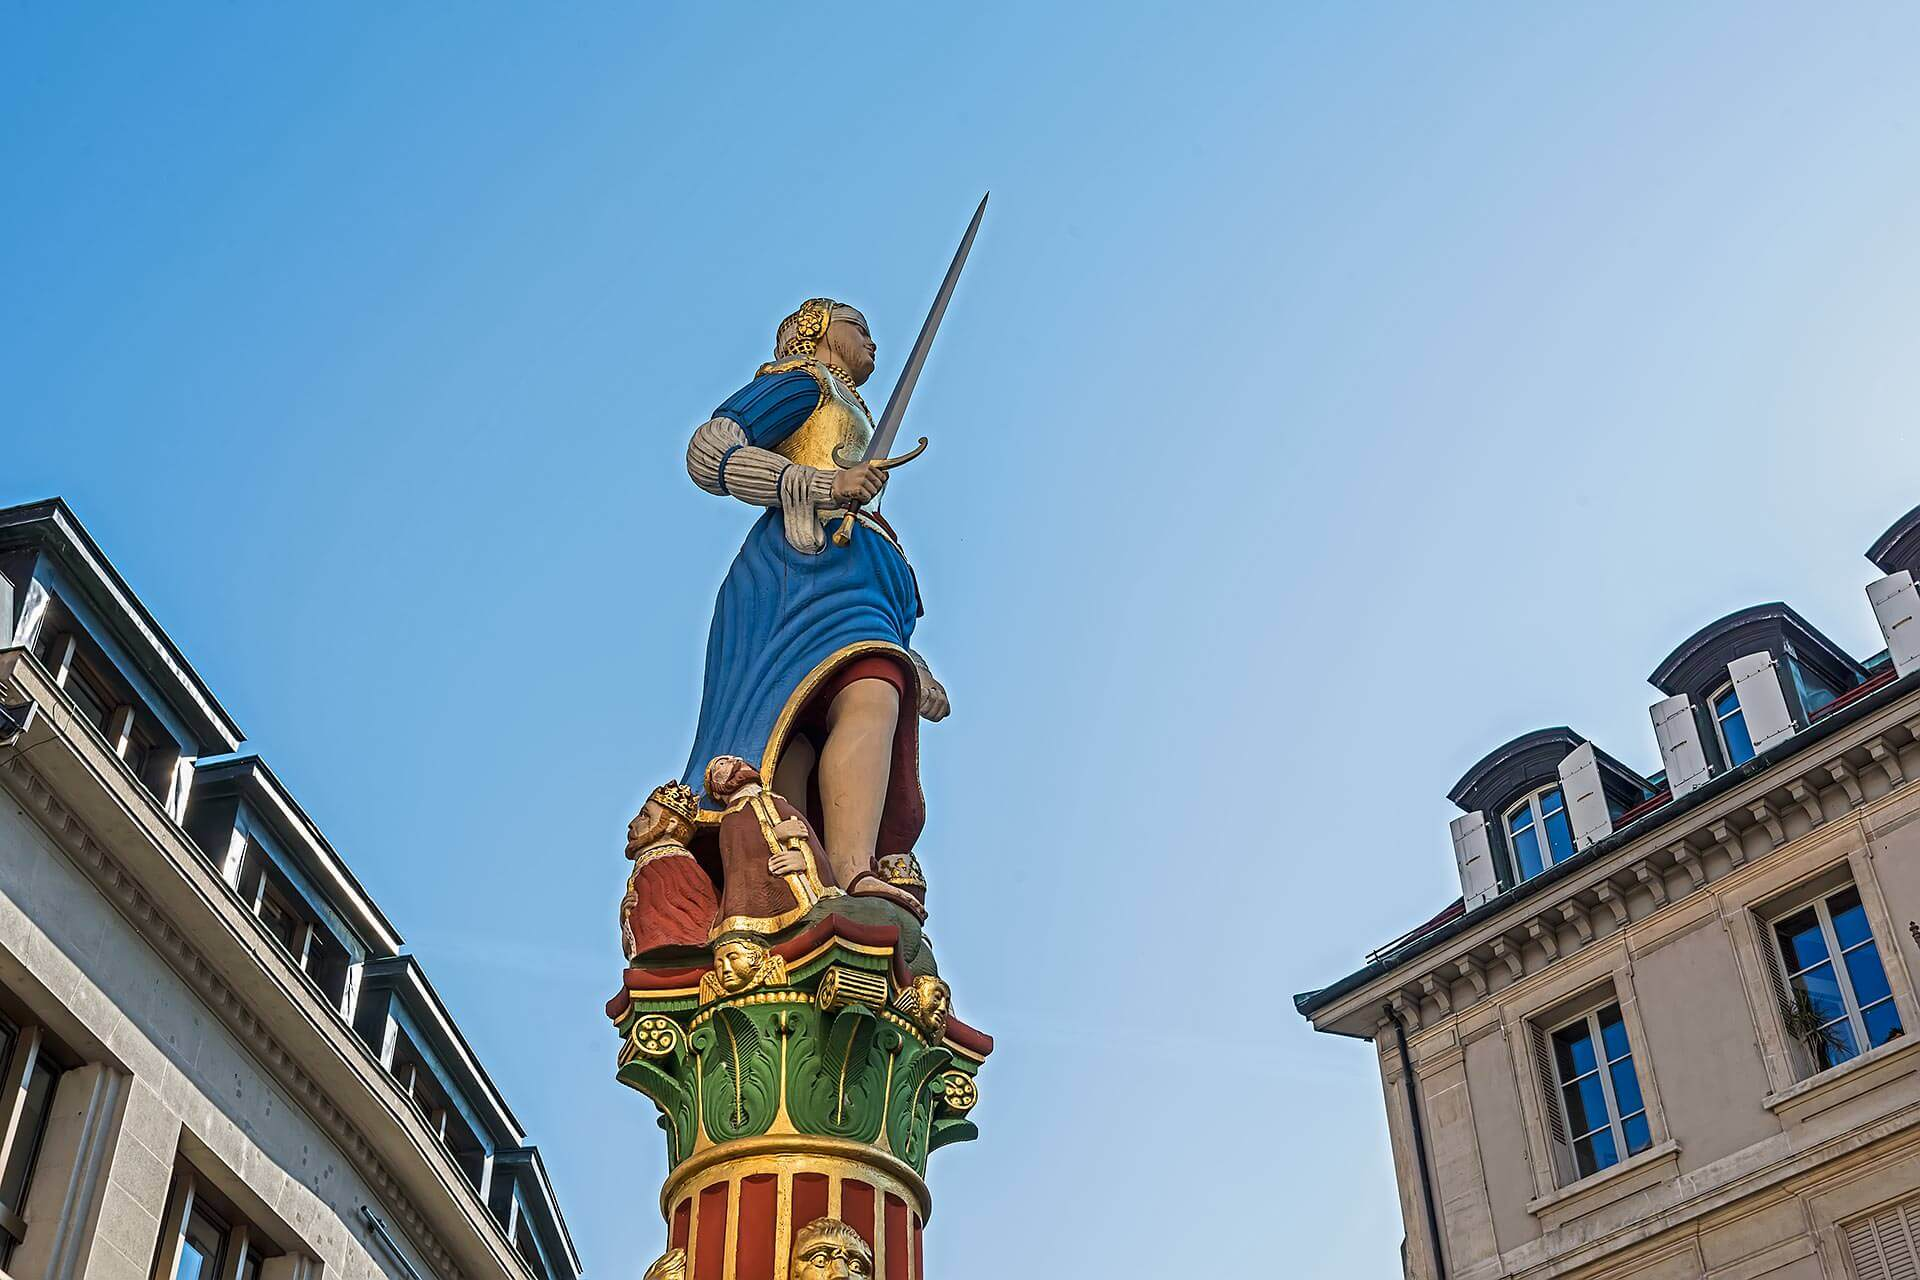 Statue Justice Lausanne © dvdesign.com